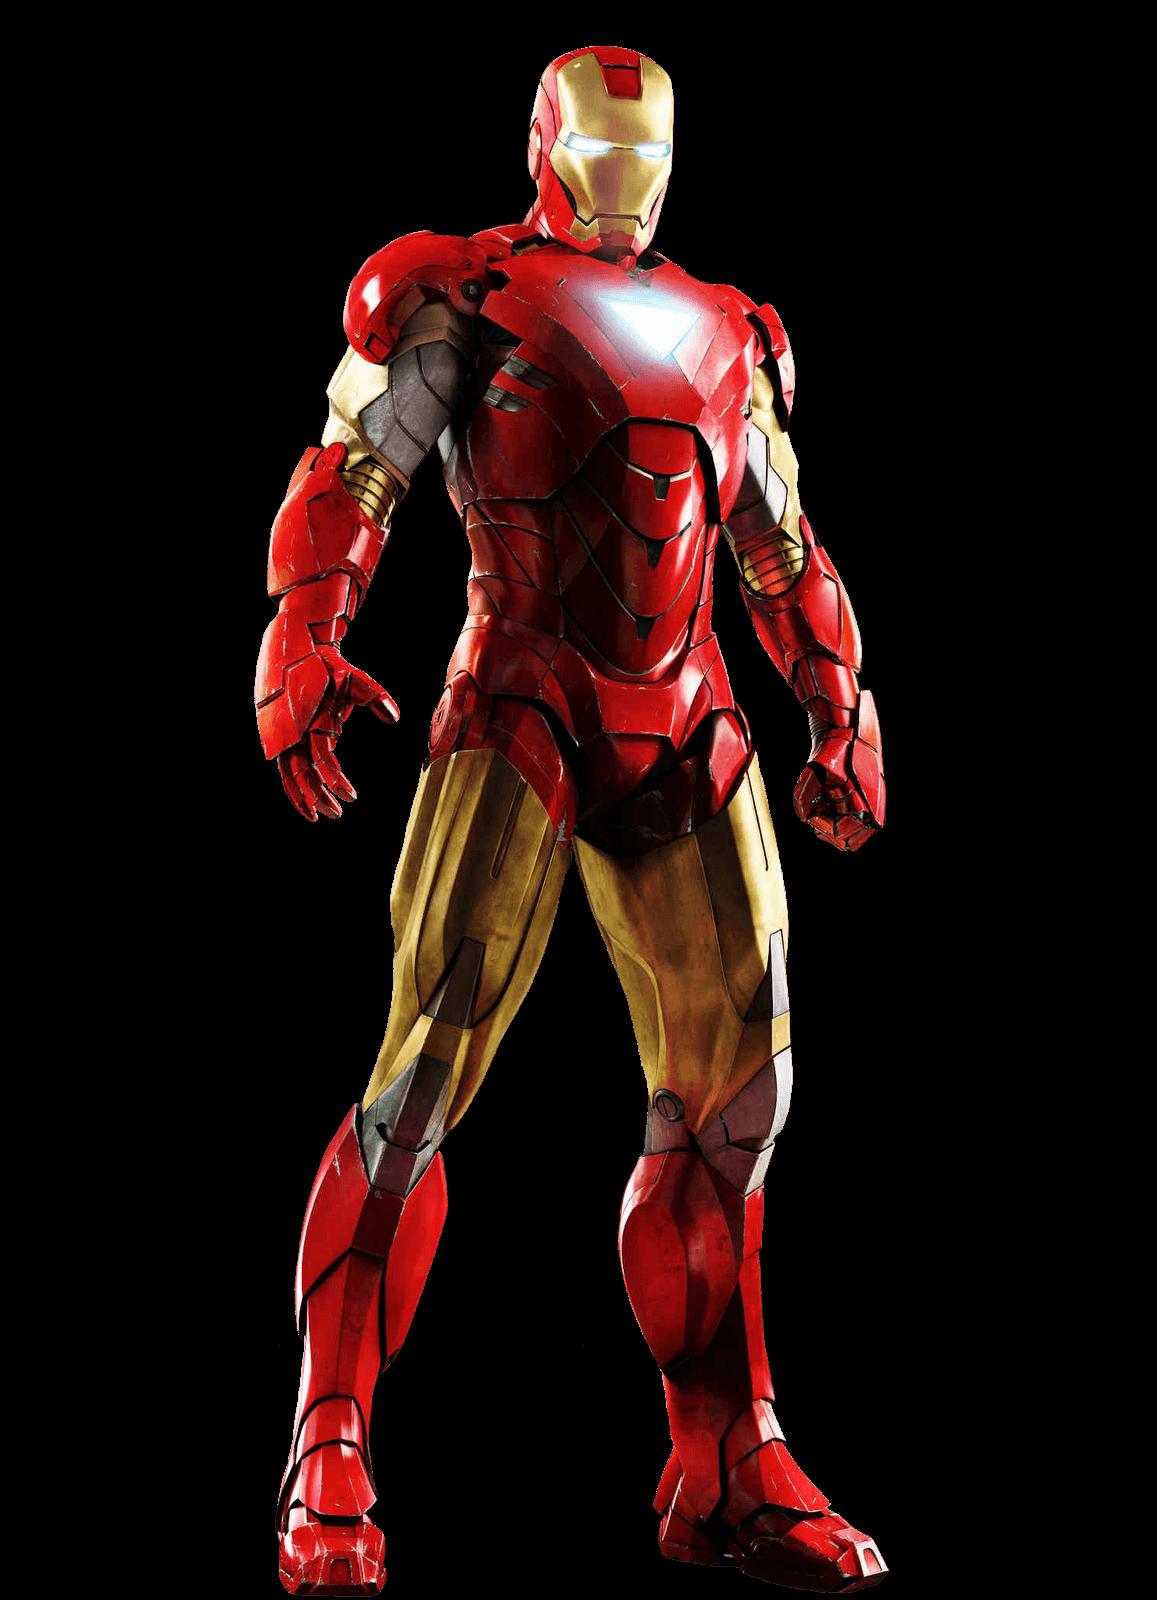 Ironman Png 53